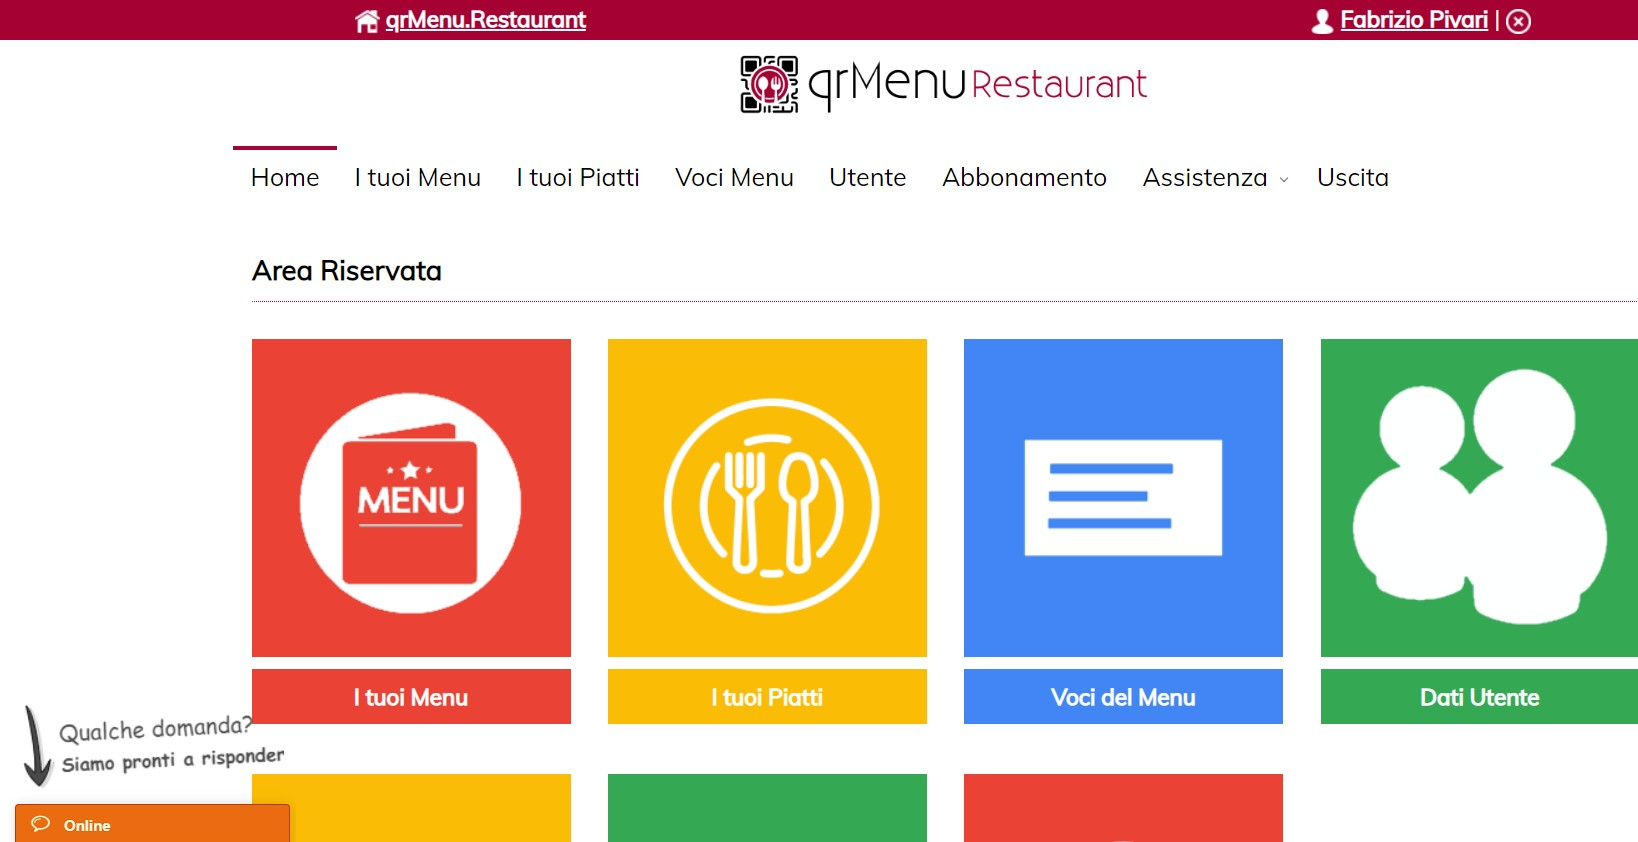 creare menu qrmenu.restaurant